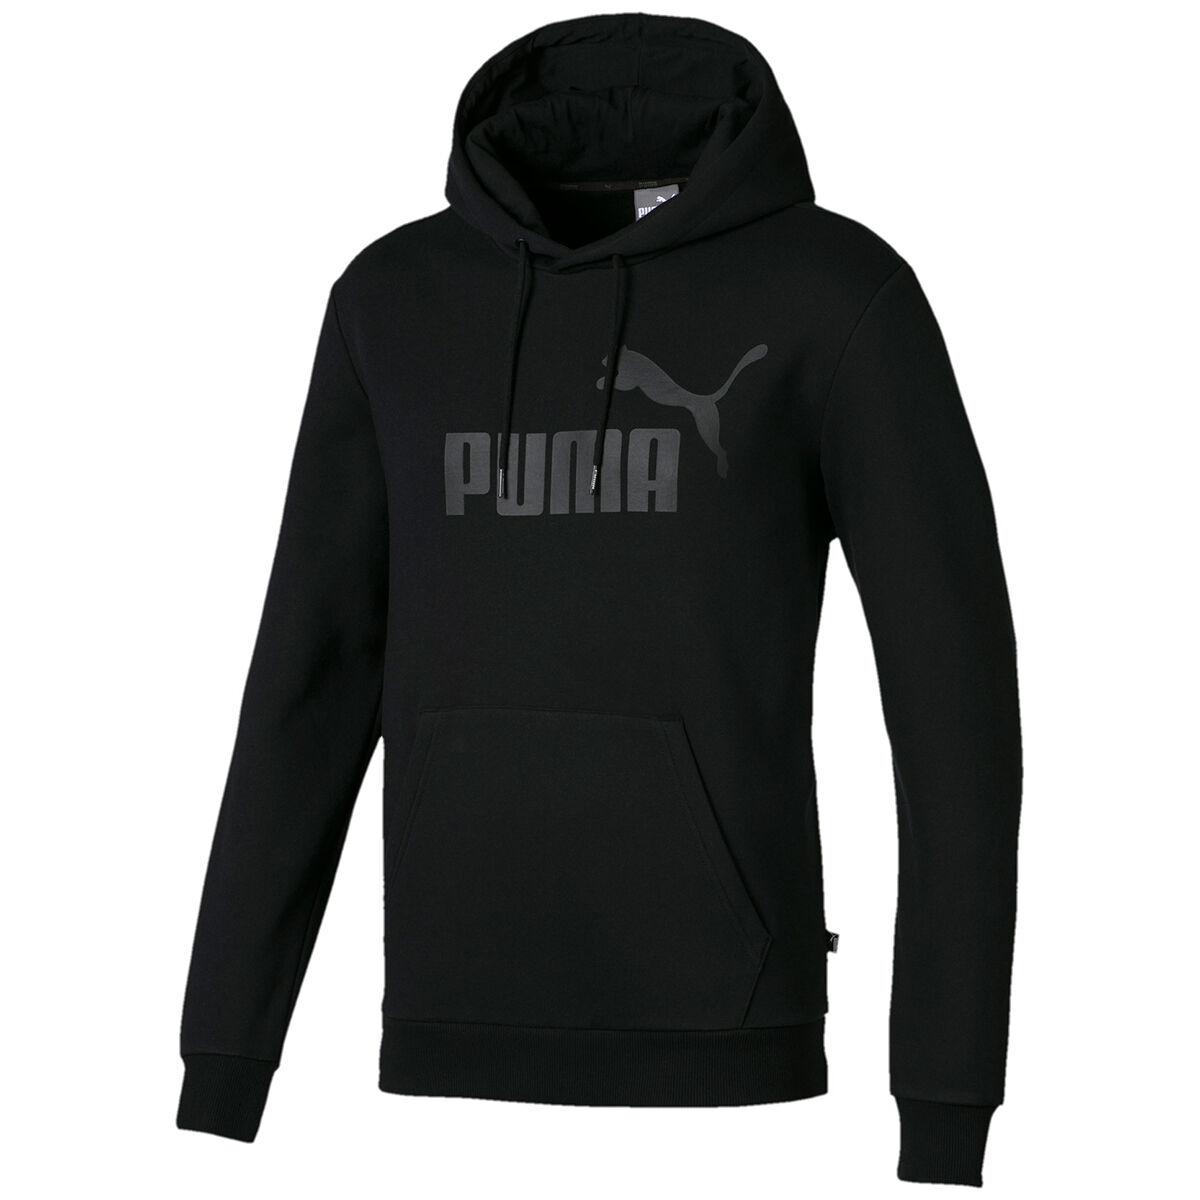 Puma Men's Essential Fleece Hoodie - Black, S